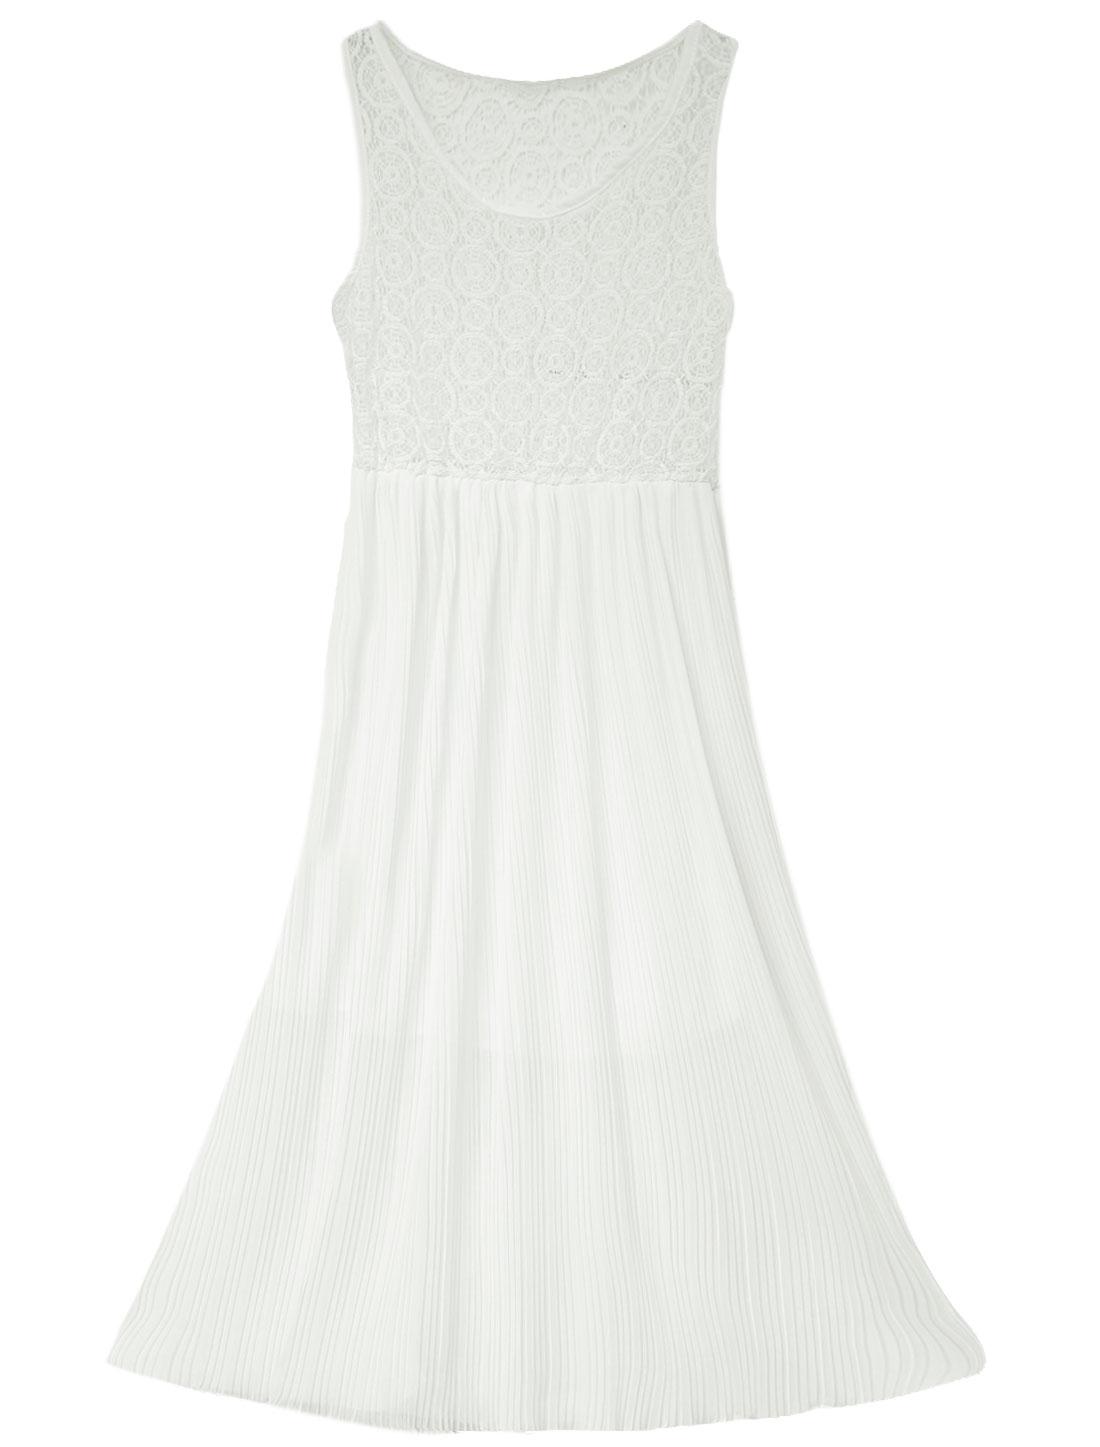 Lady Sleeveless Stretchy Waist Lace Panel Pleated Dress White XS